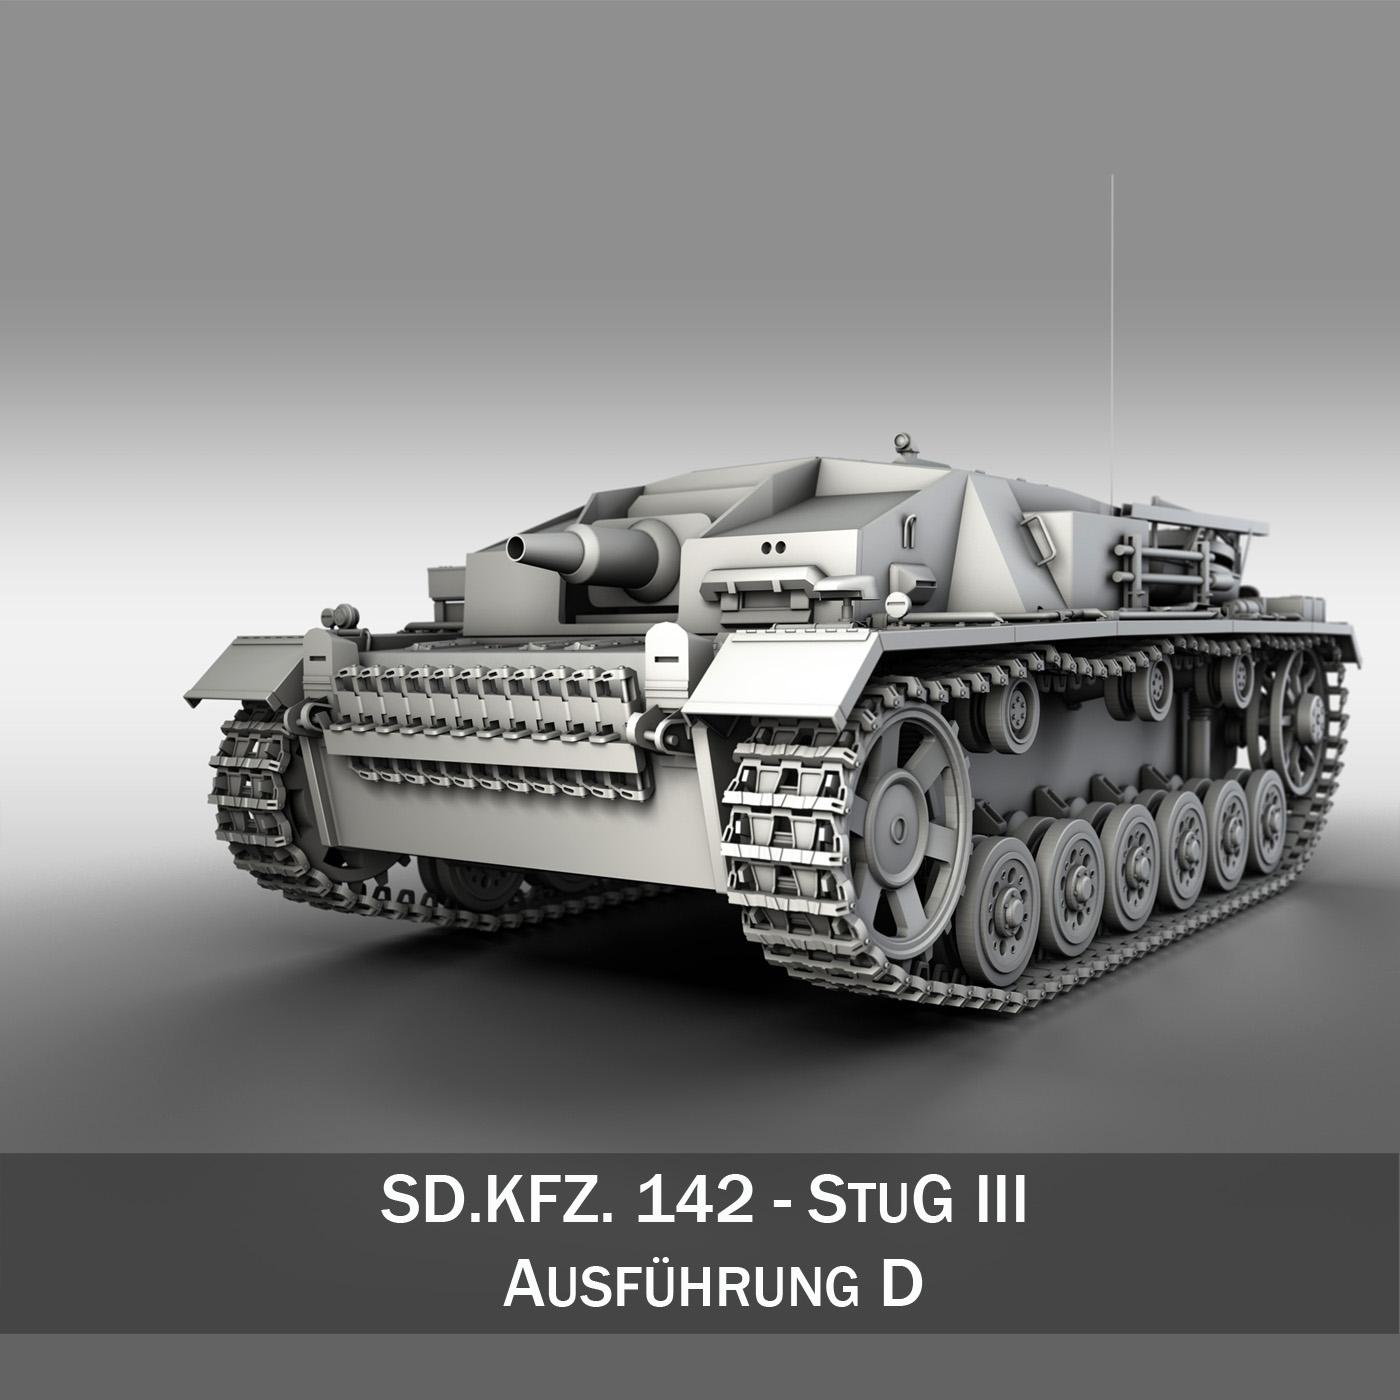 sdkfz. 142 - stug 3 - ausf.d múnla 3d 3ds fbx c4d lwo obj 251608